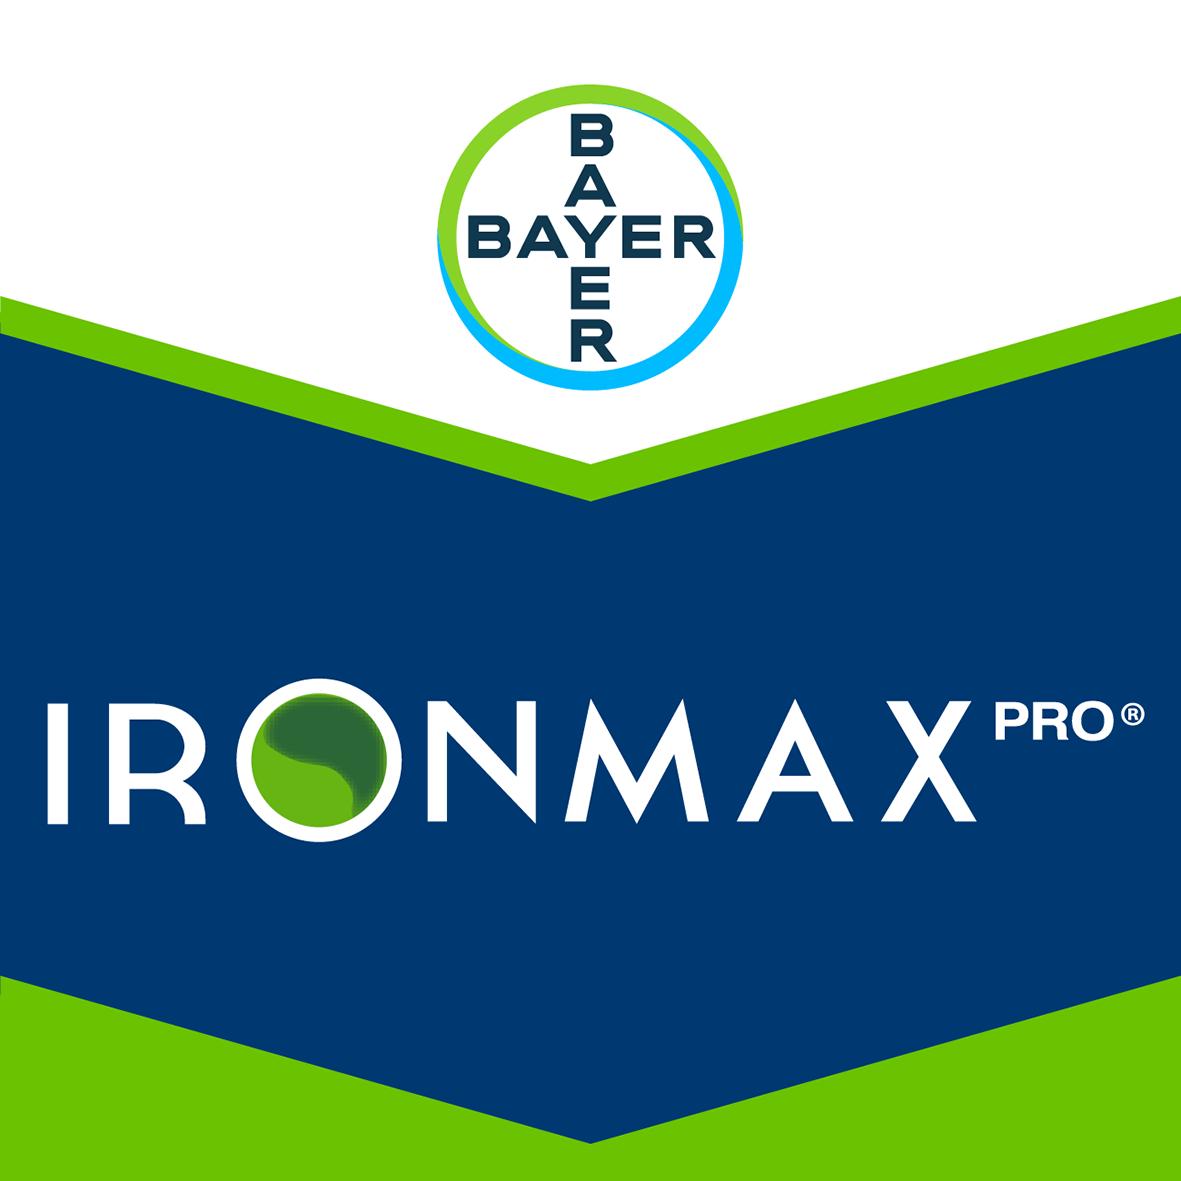 Ironmax® Pro